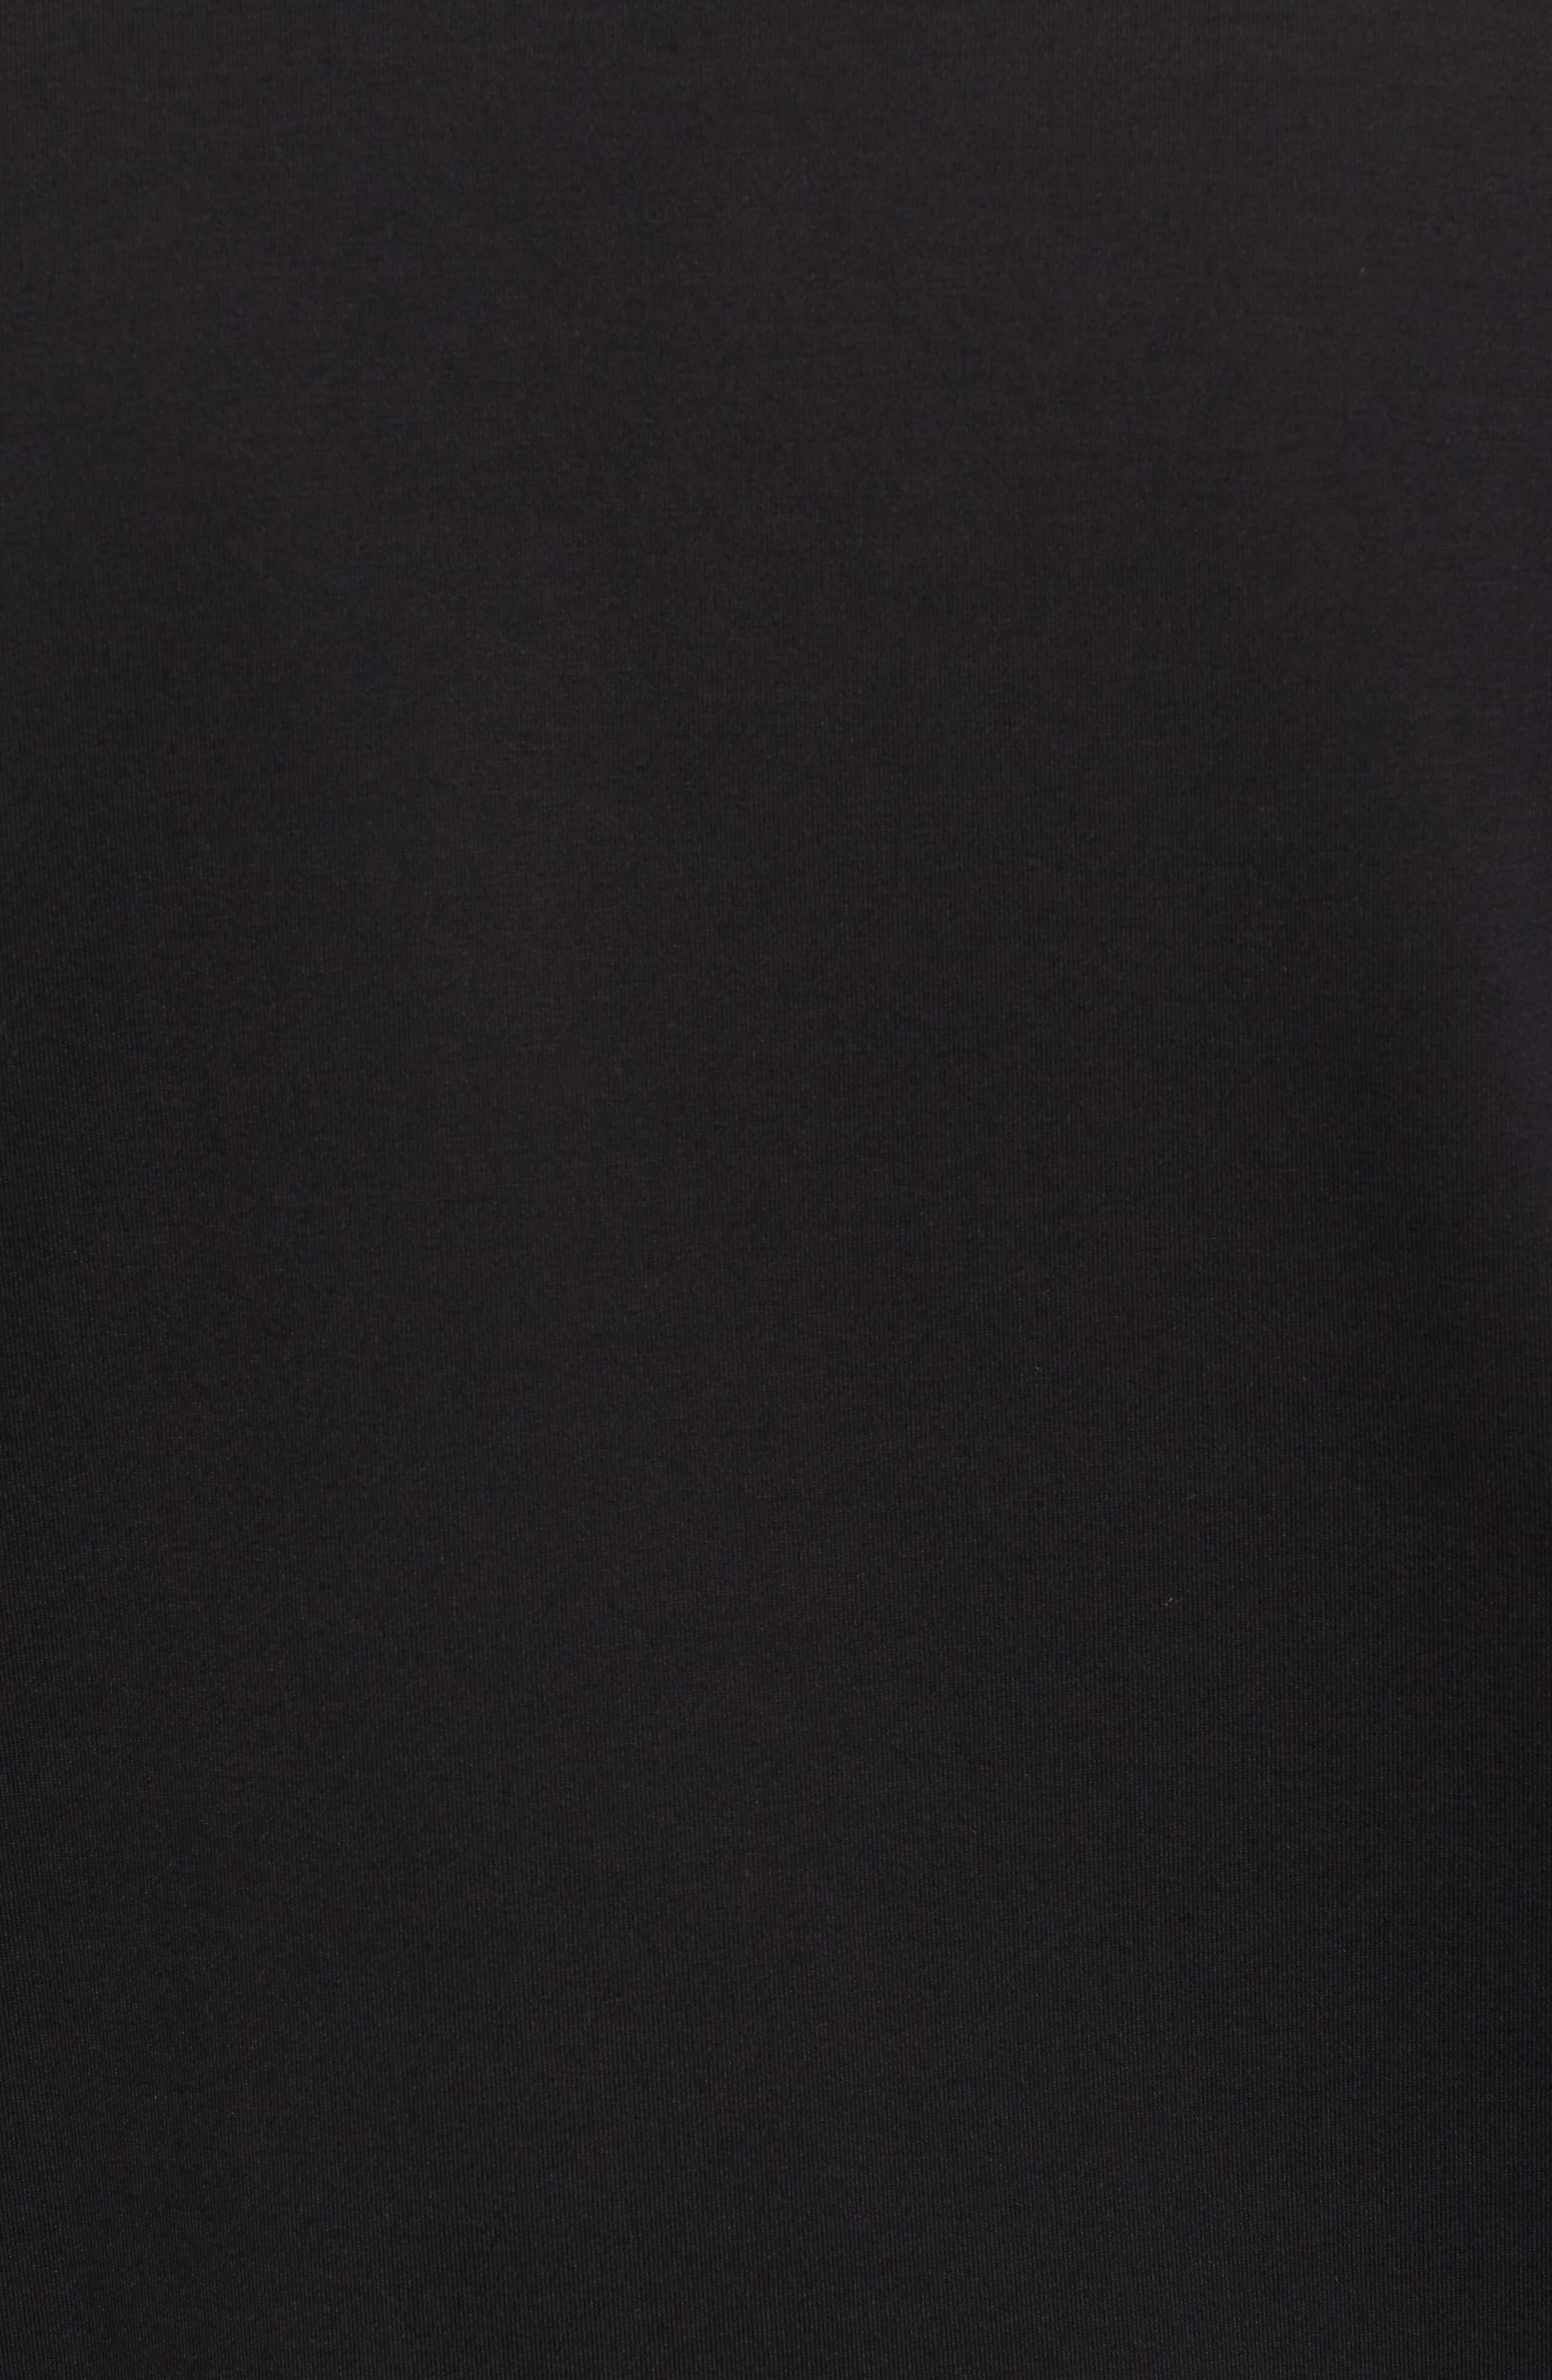 Soule Mercedes Slim Fit Zip Jacket,                             Alternate thumbnail 5, color,                             Black